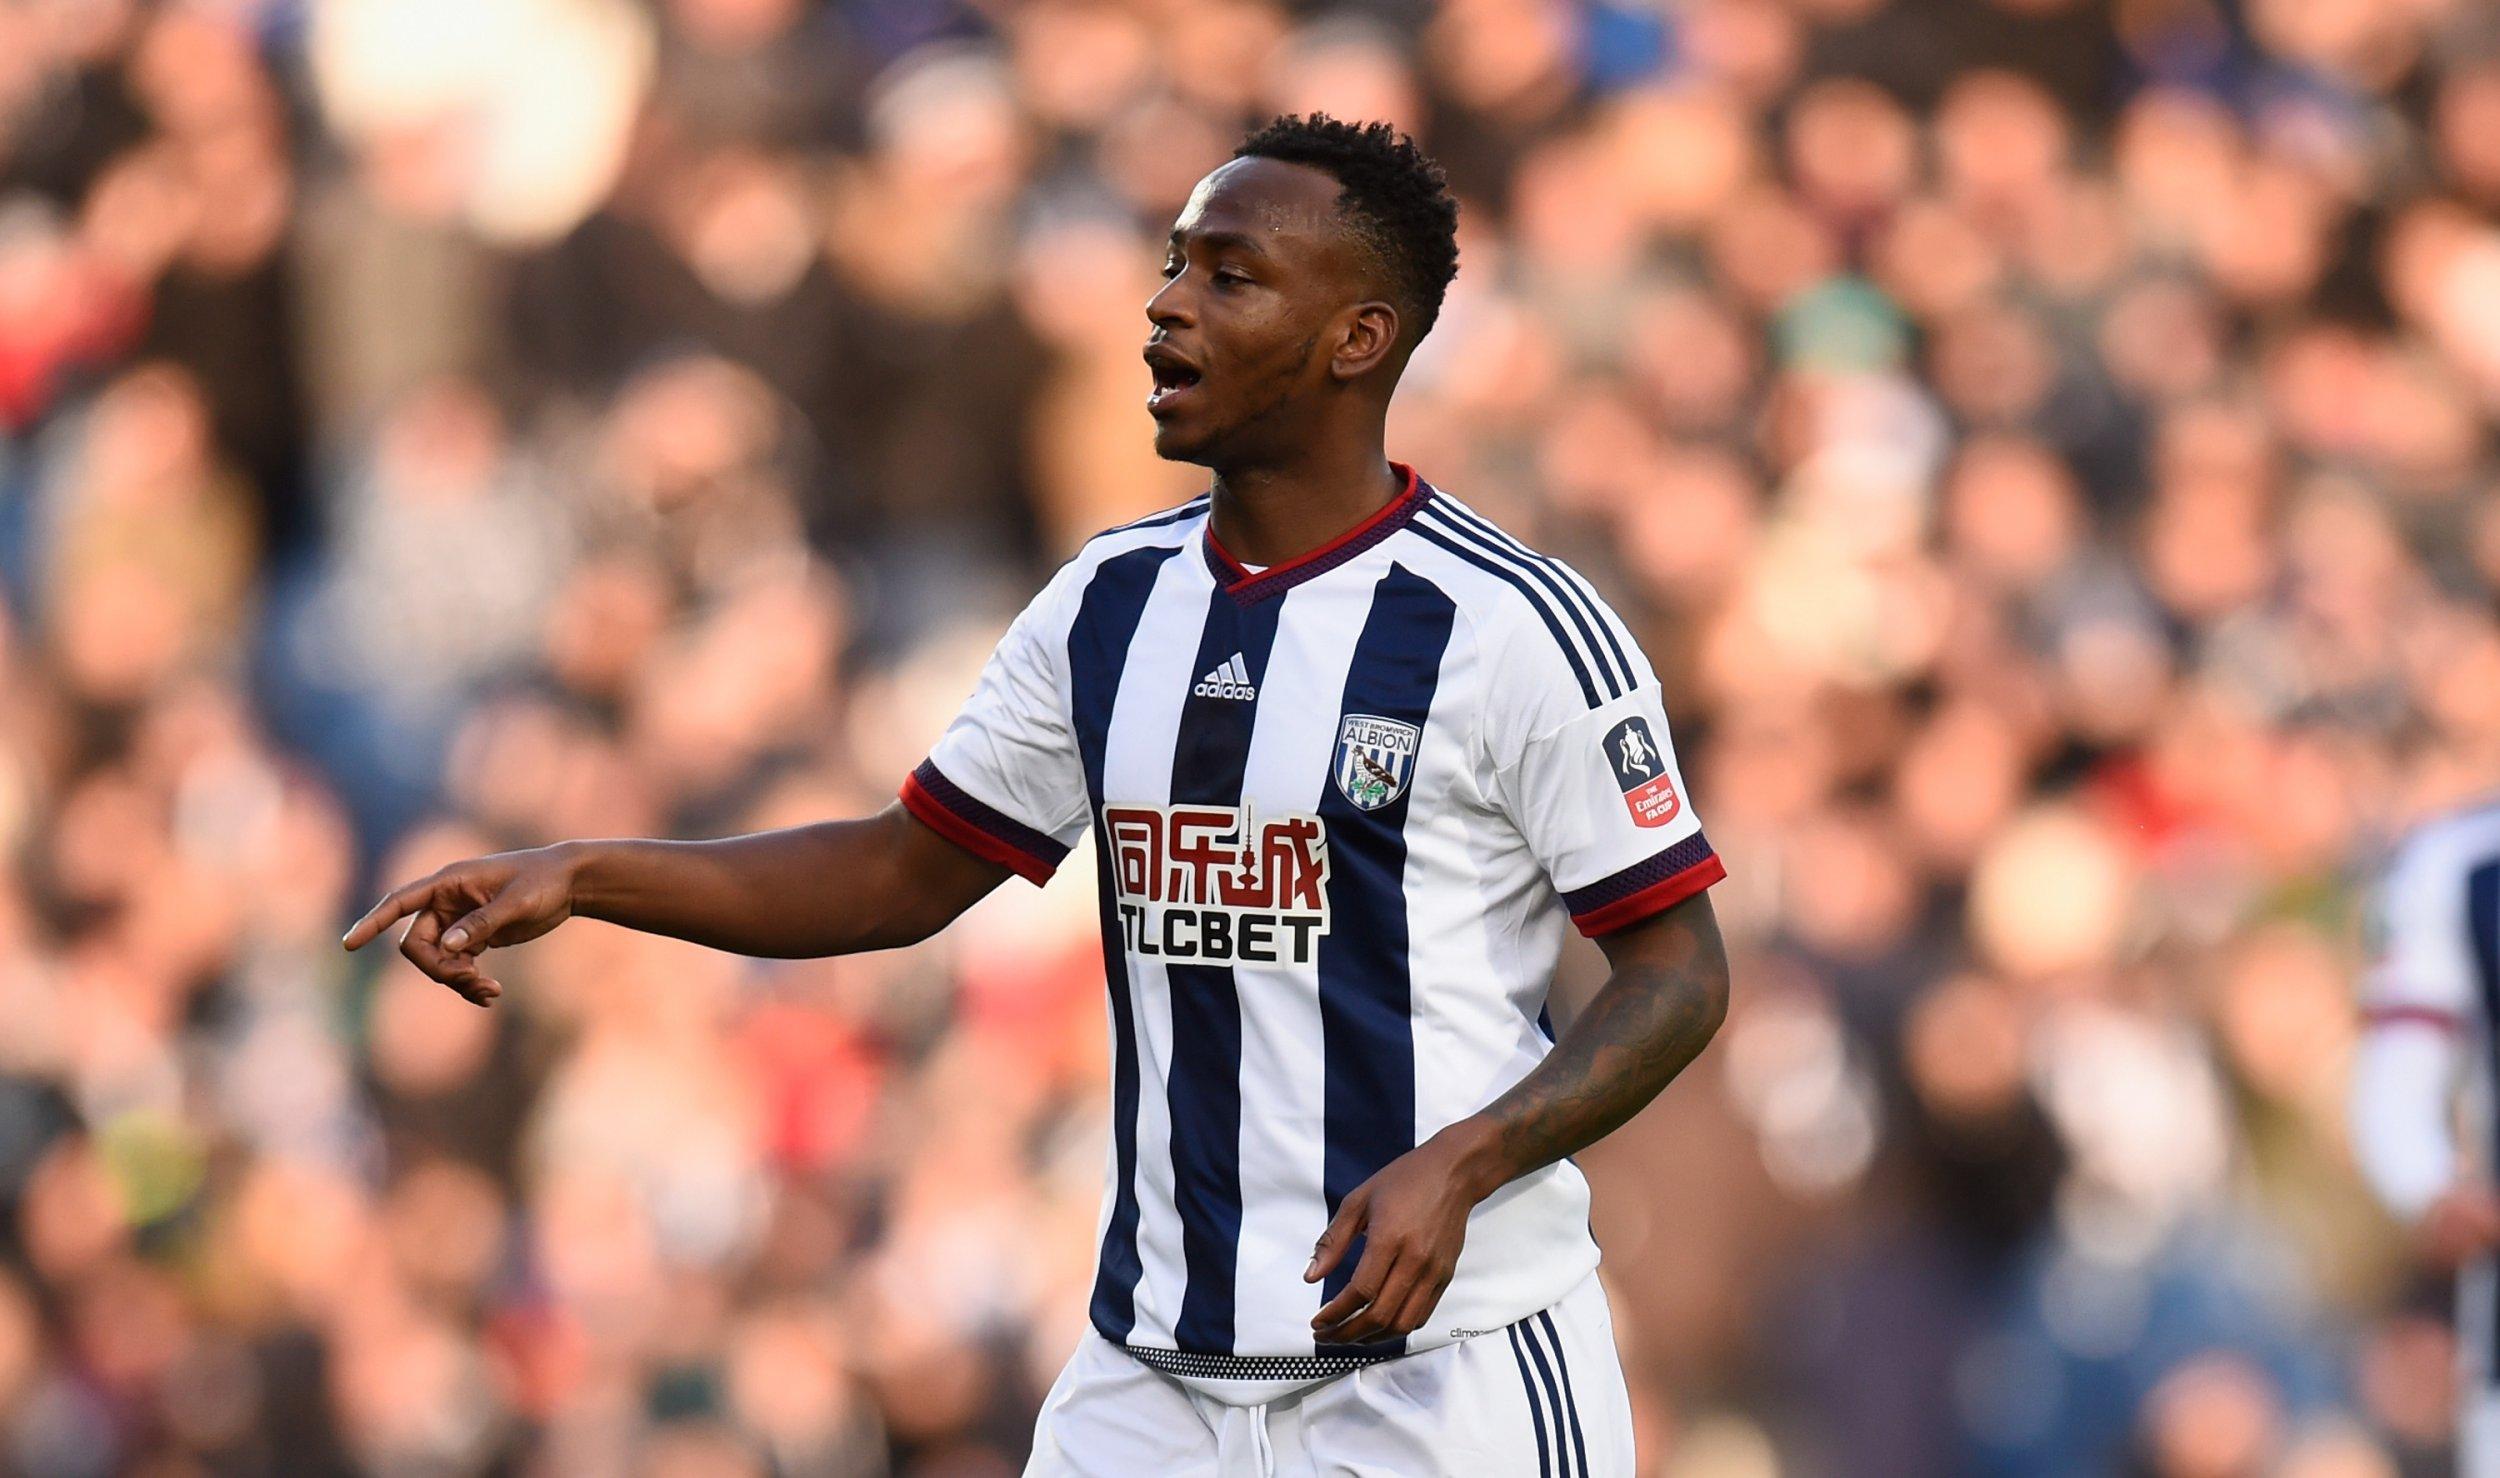 Saido Berahino could be on the move to Tottenham.